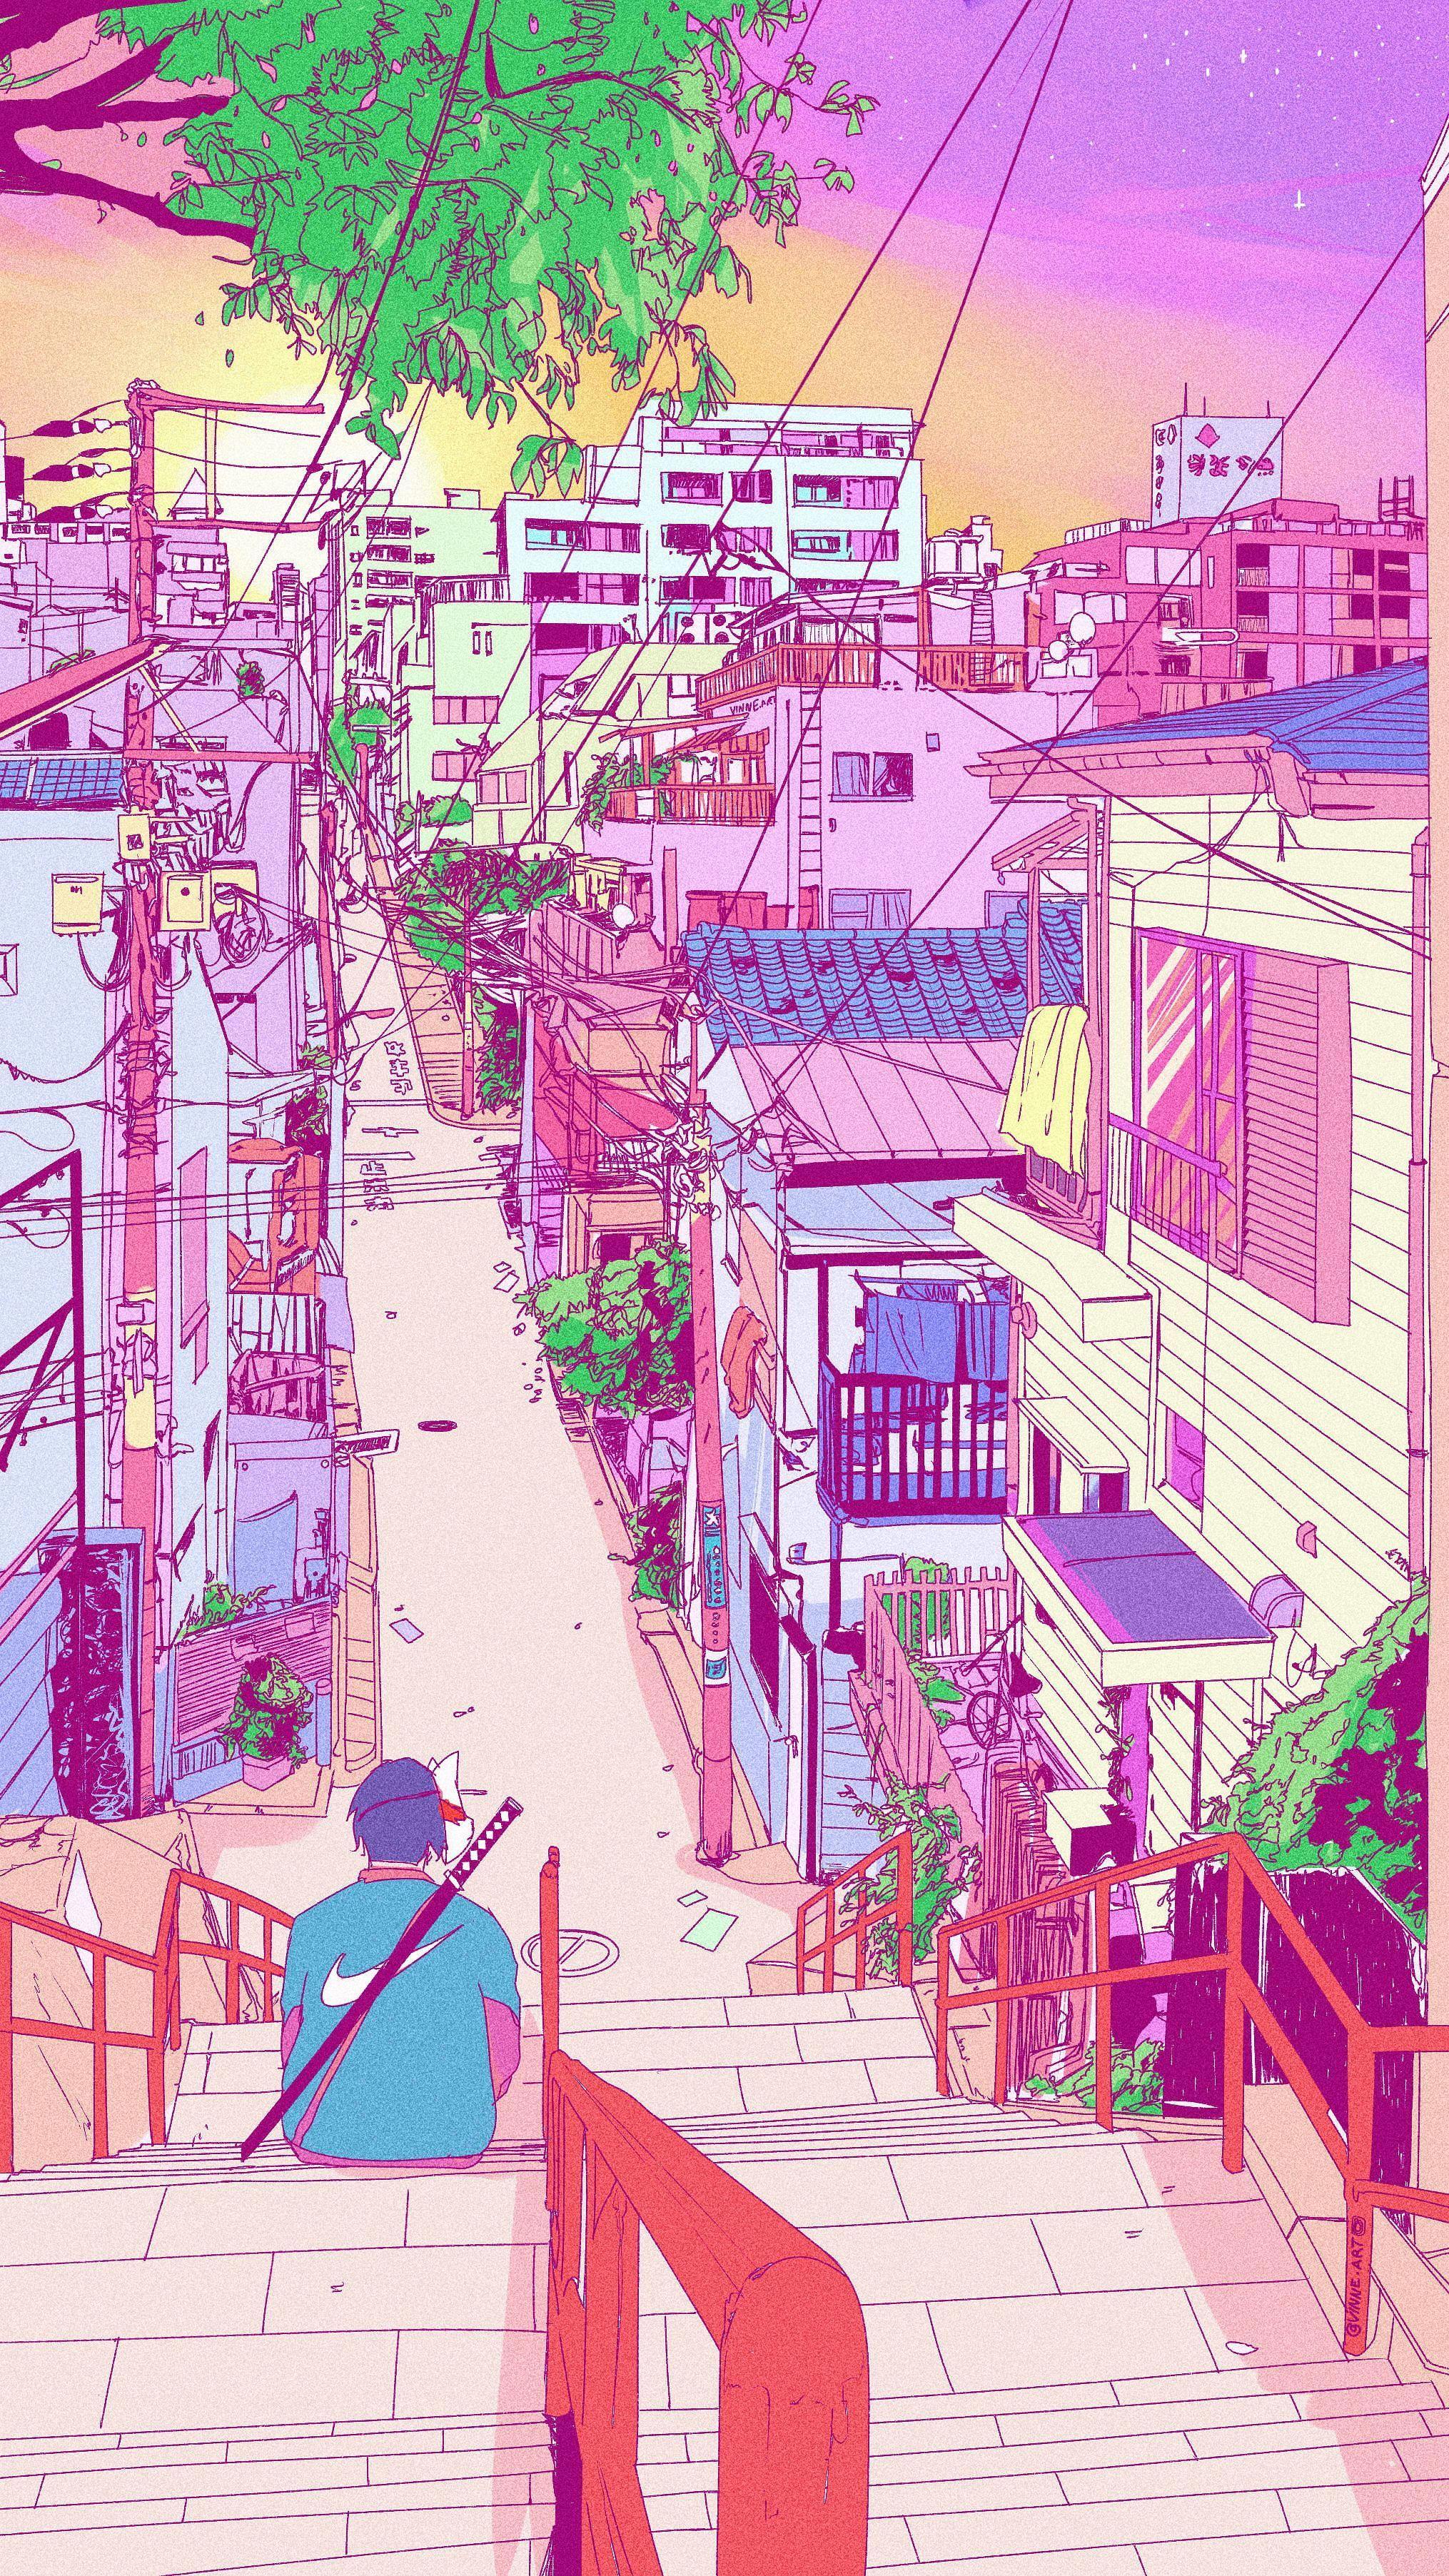 Retro Anime Aesthetic Wallpapers Top Free Retro Anime Aesthetic Backgrounds Wallpaperaccess